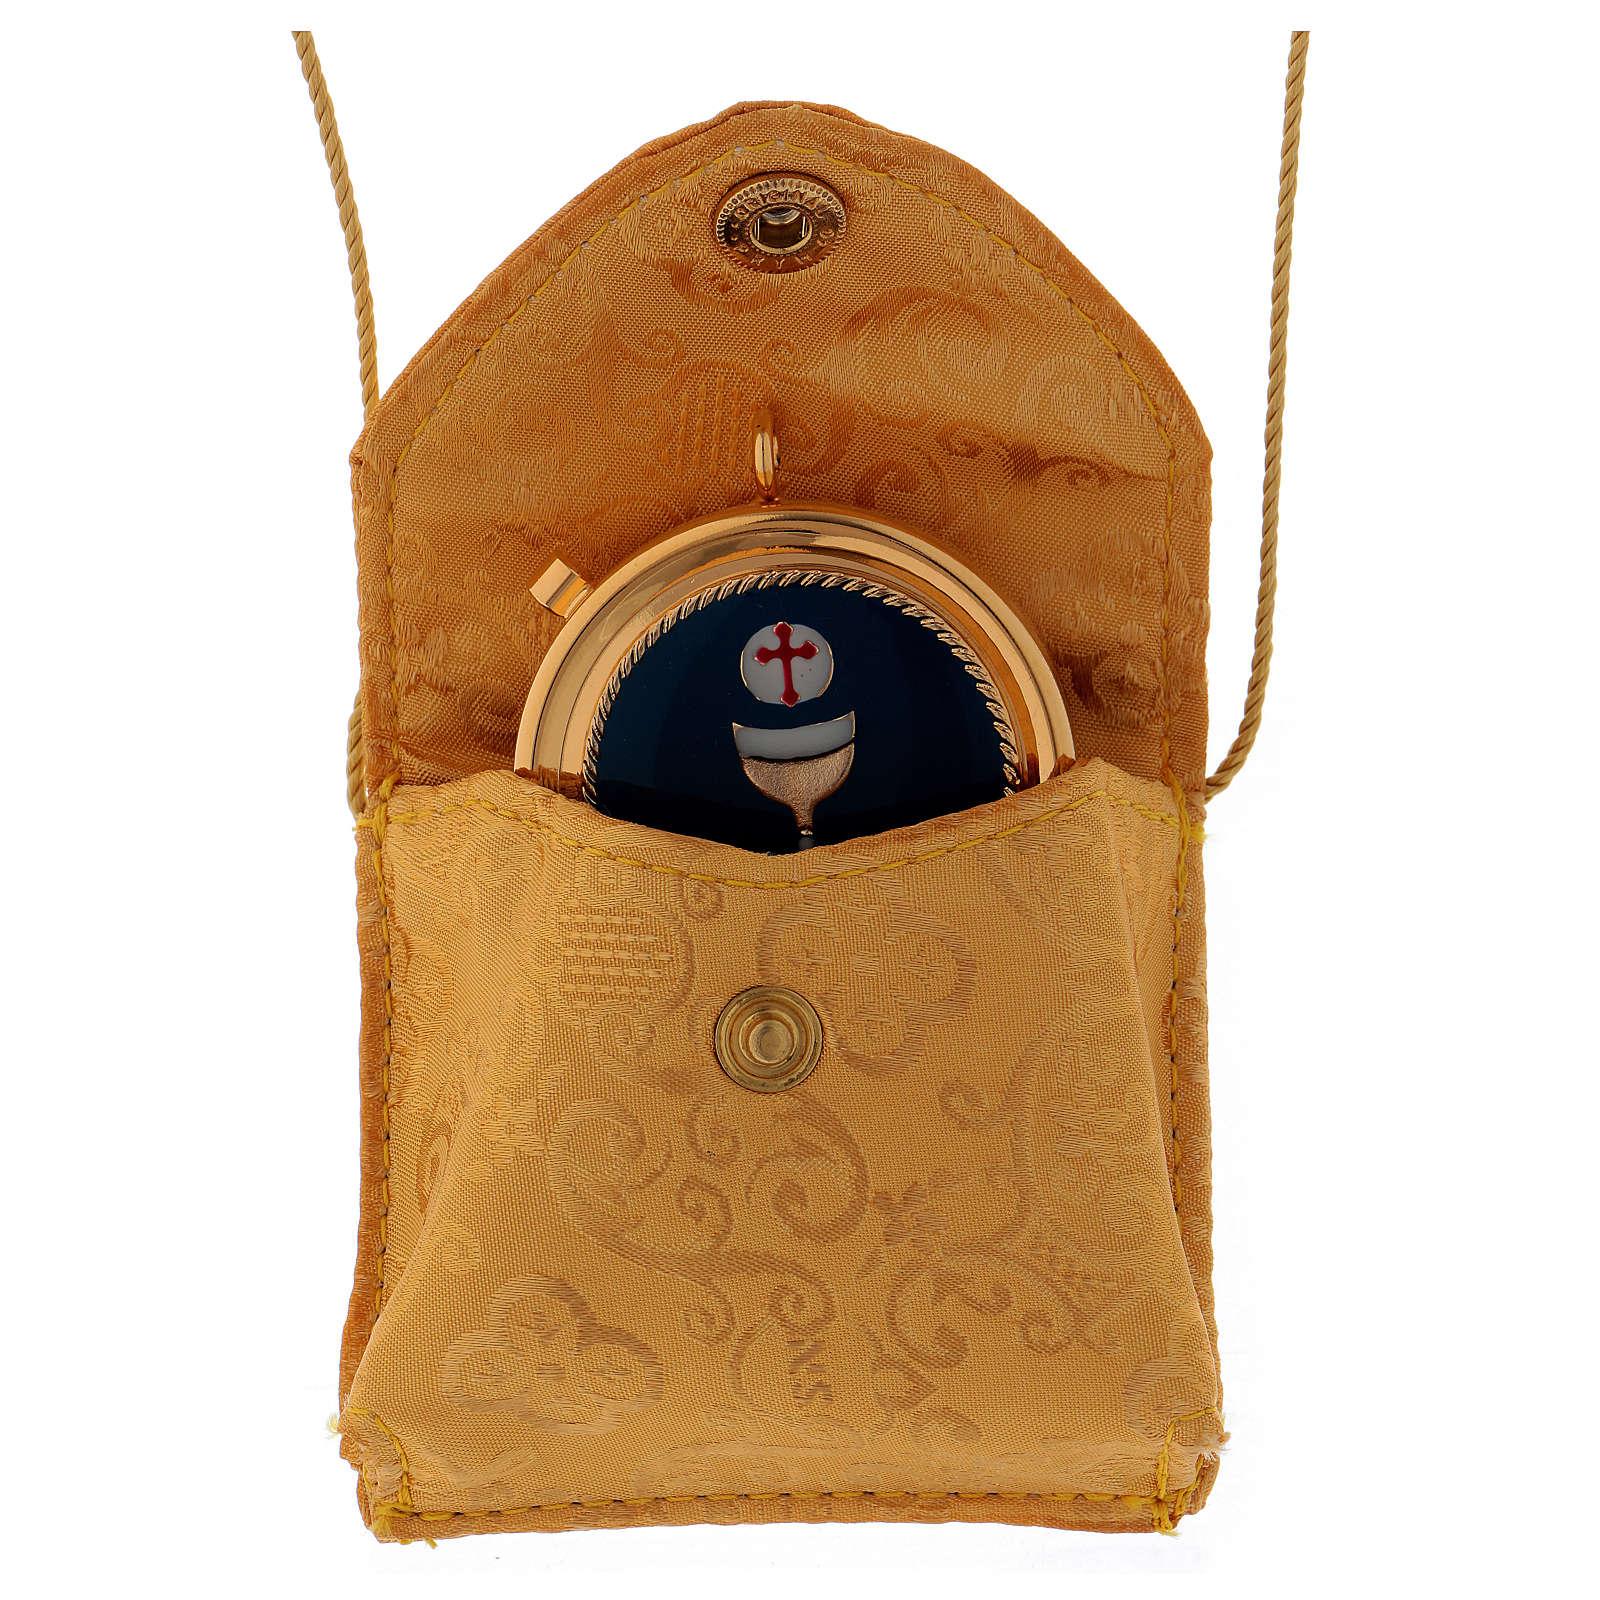 Borsa portateca in raso giallo con teca dorata diametro 5 cm 3